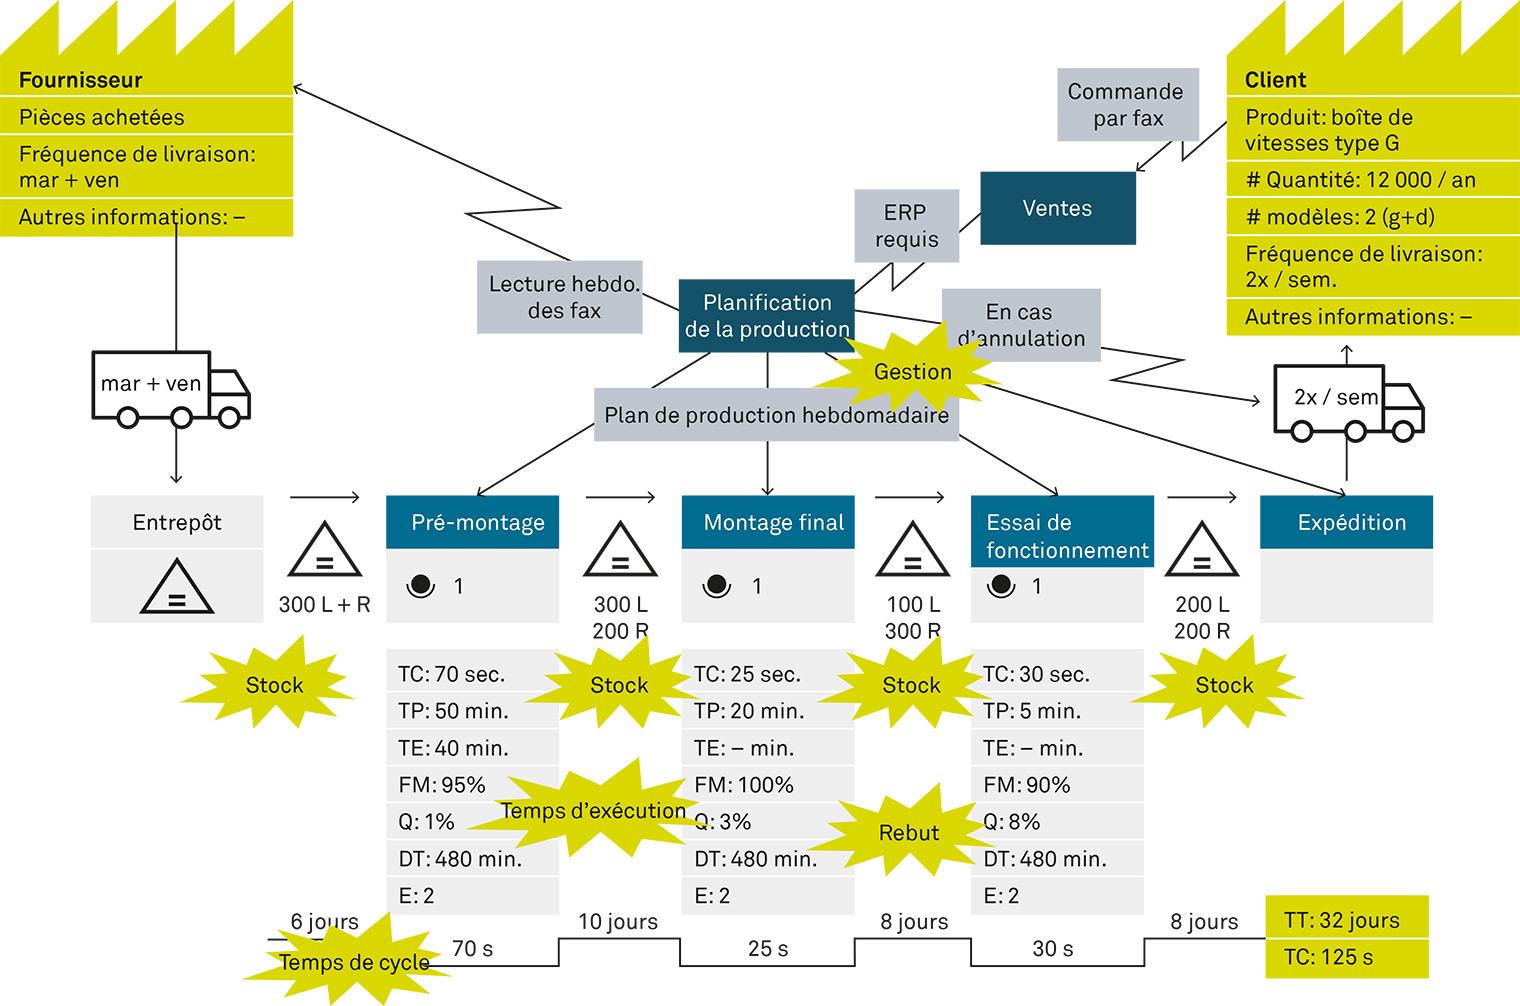 Optimierungspotenziale_identifizieren_fr@2